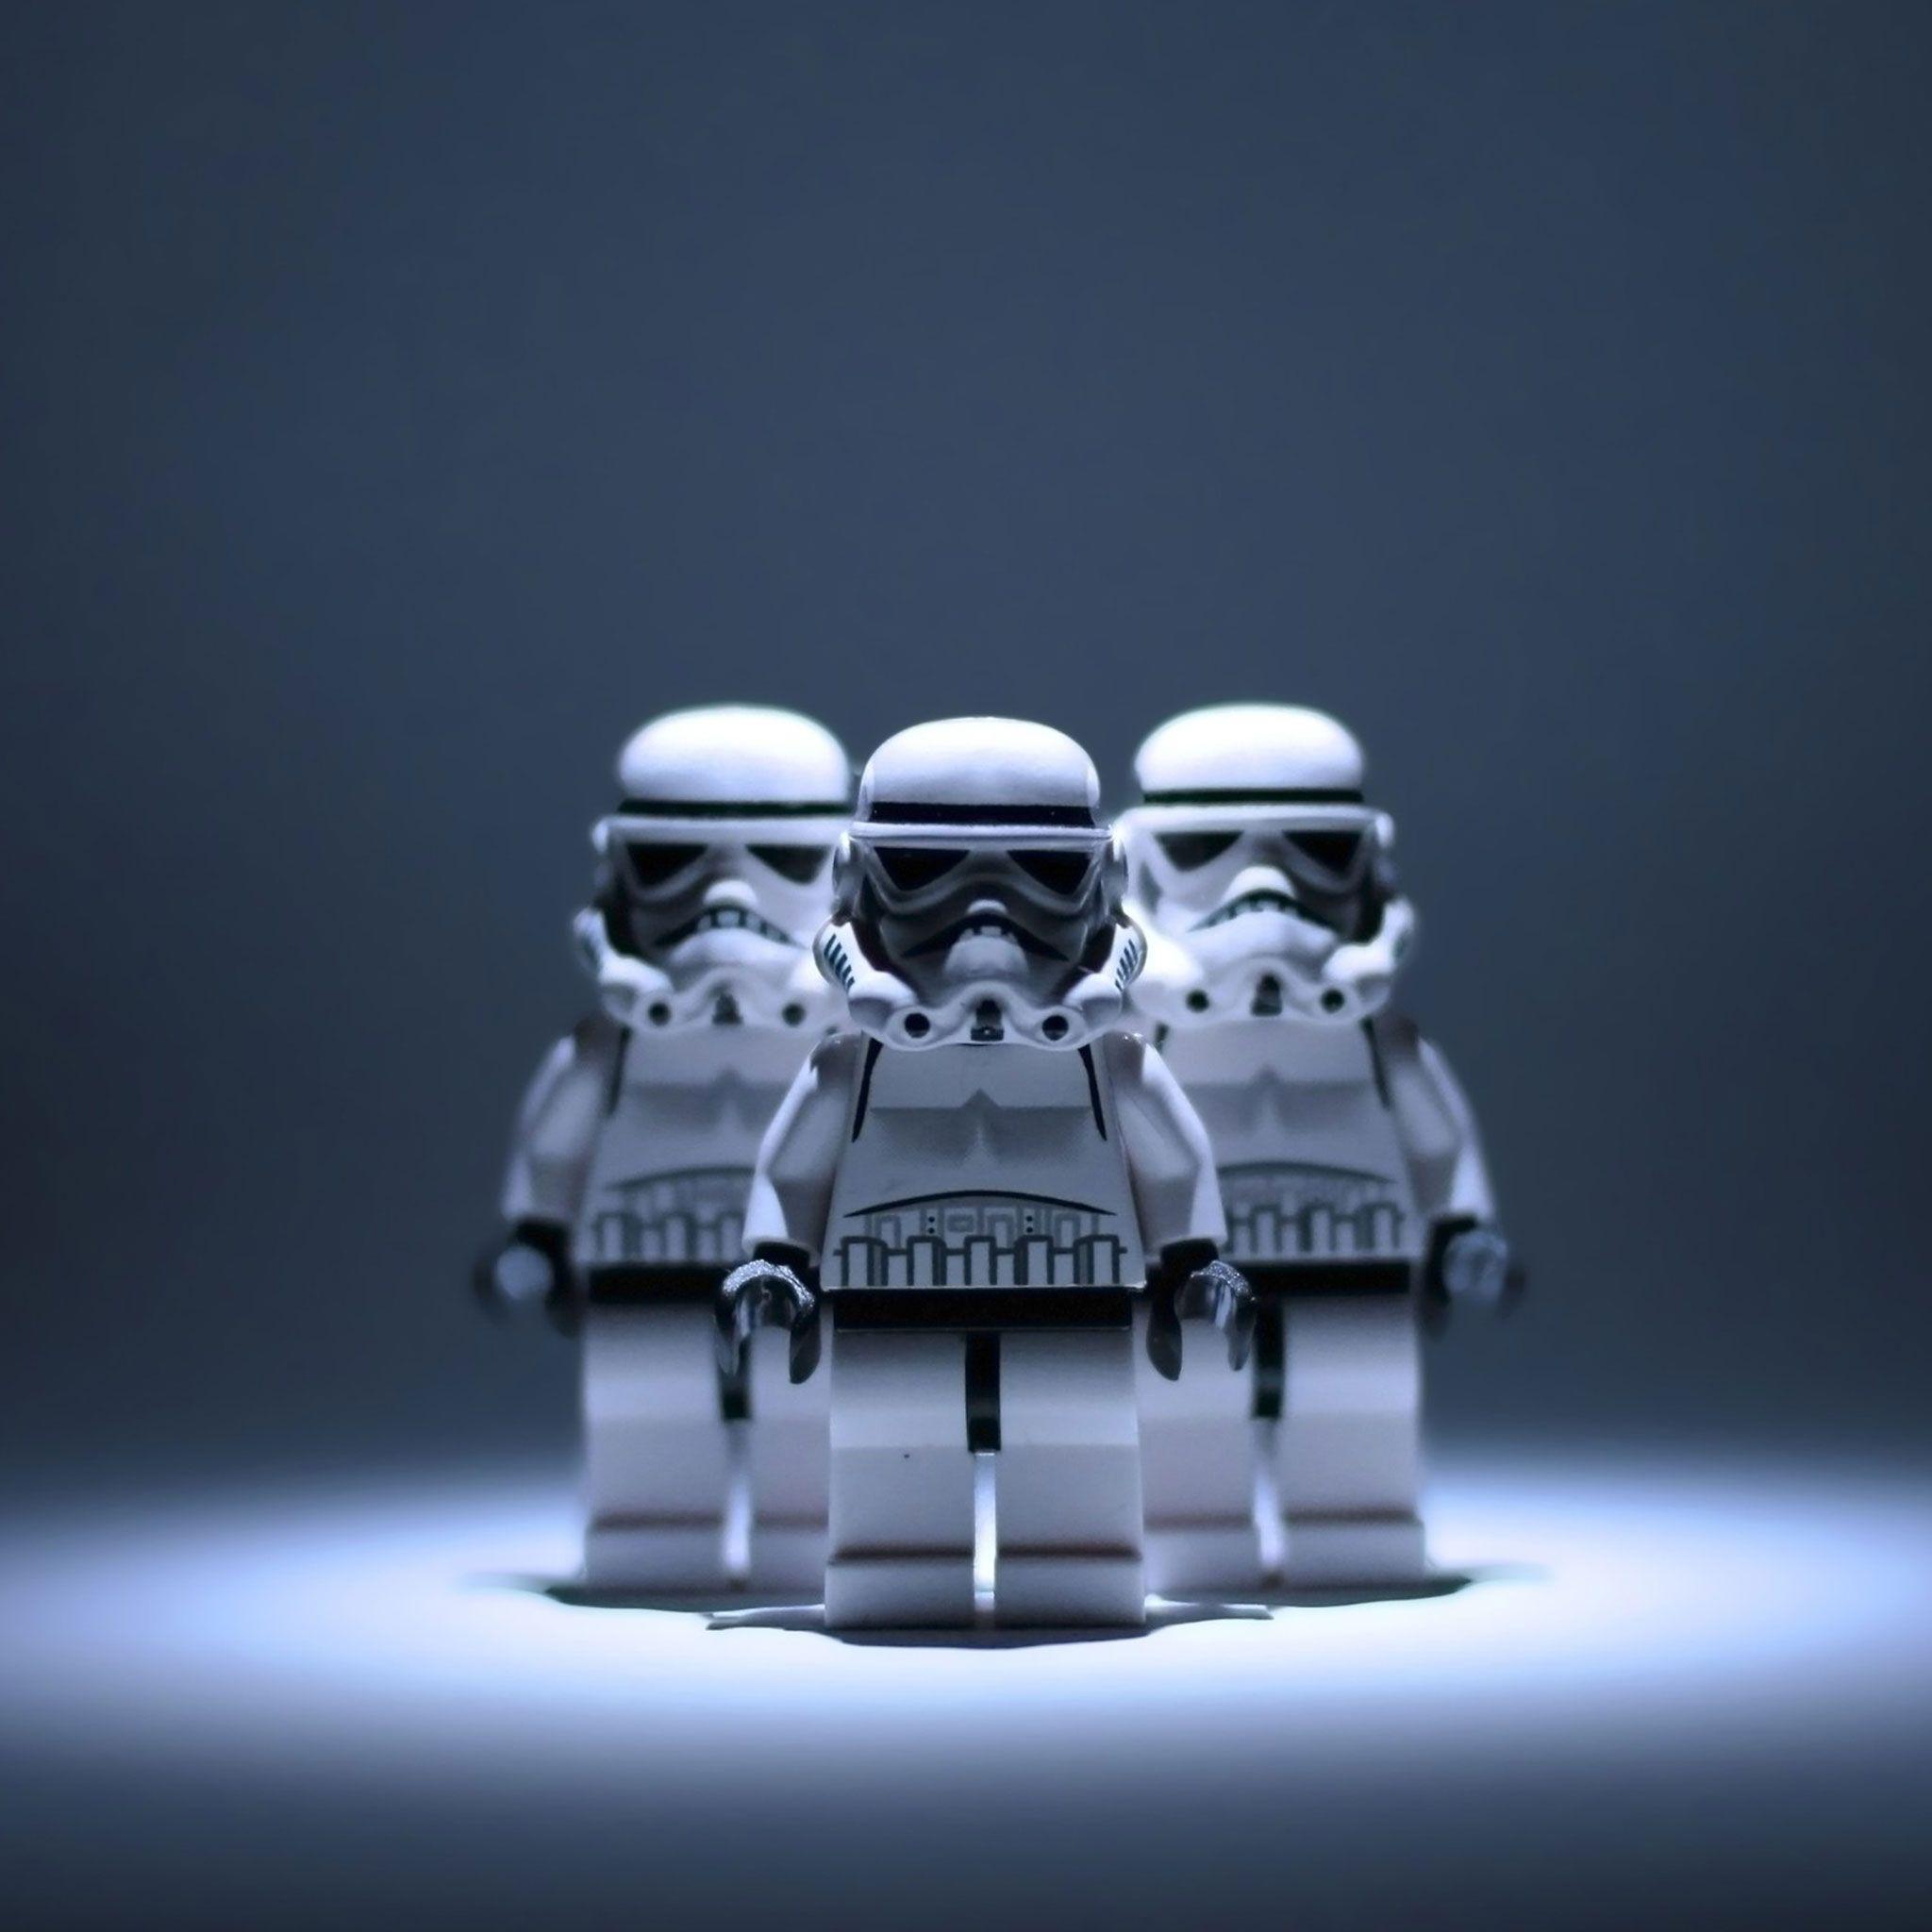 Star Wars Ipad Wallpapers Top Free Star Wars Ipad Backgrounds Wallpaperaccess